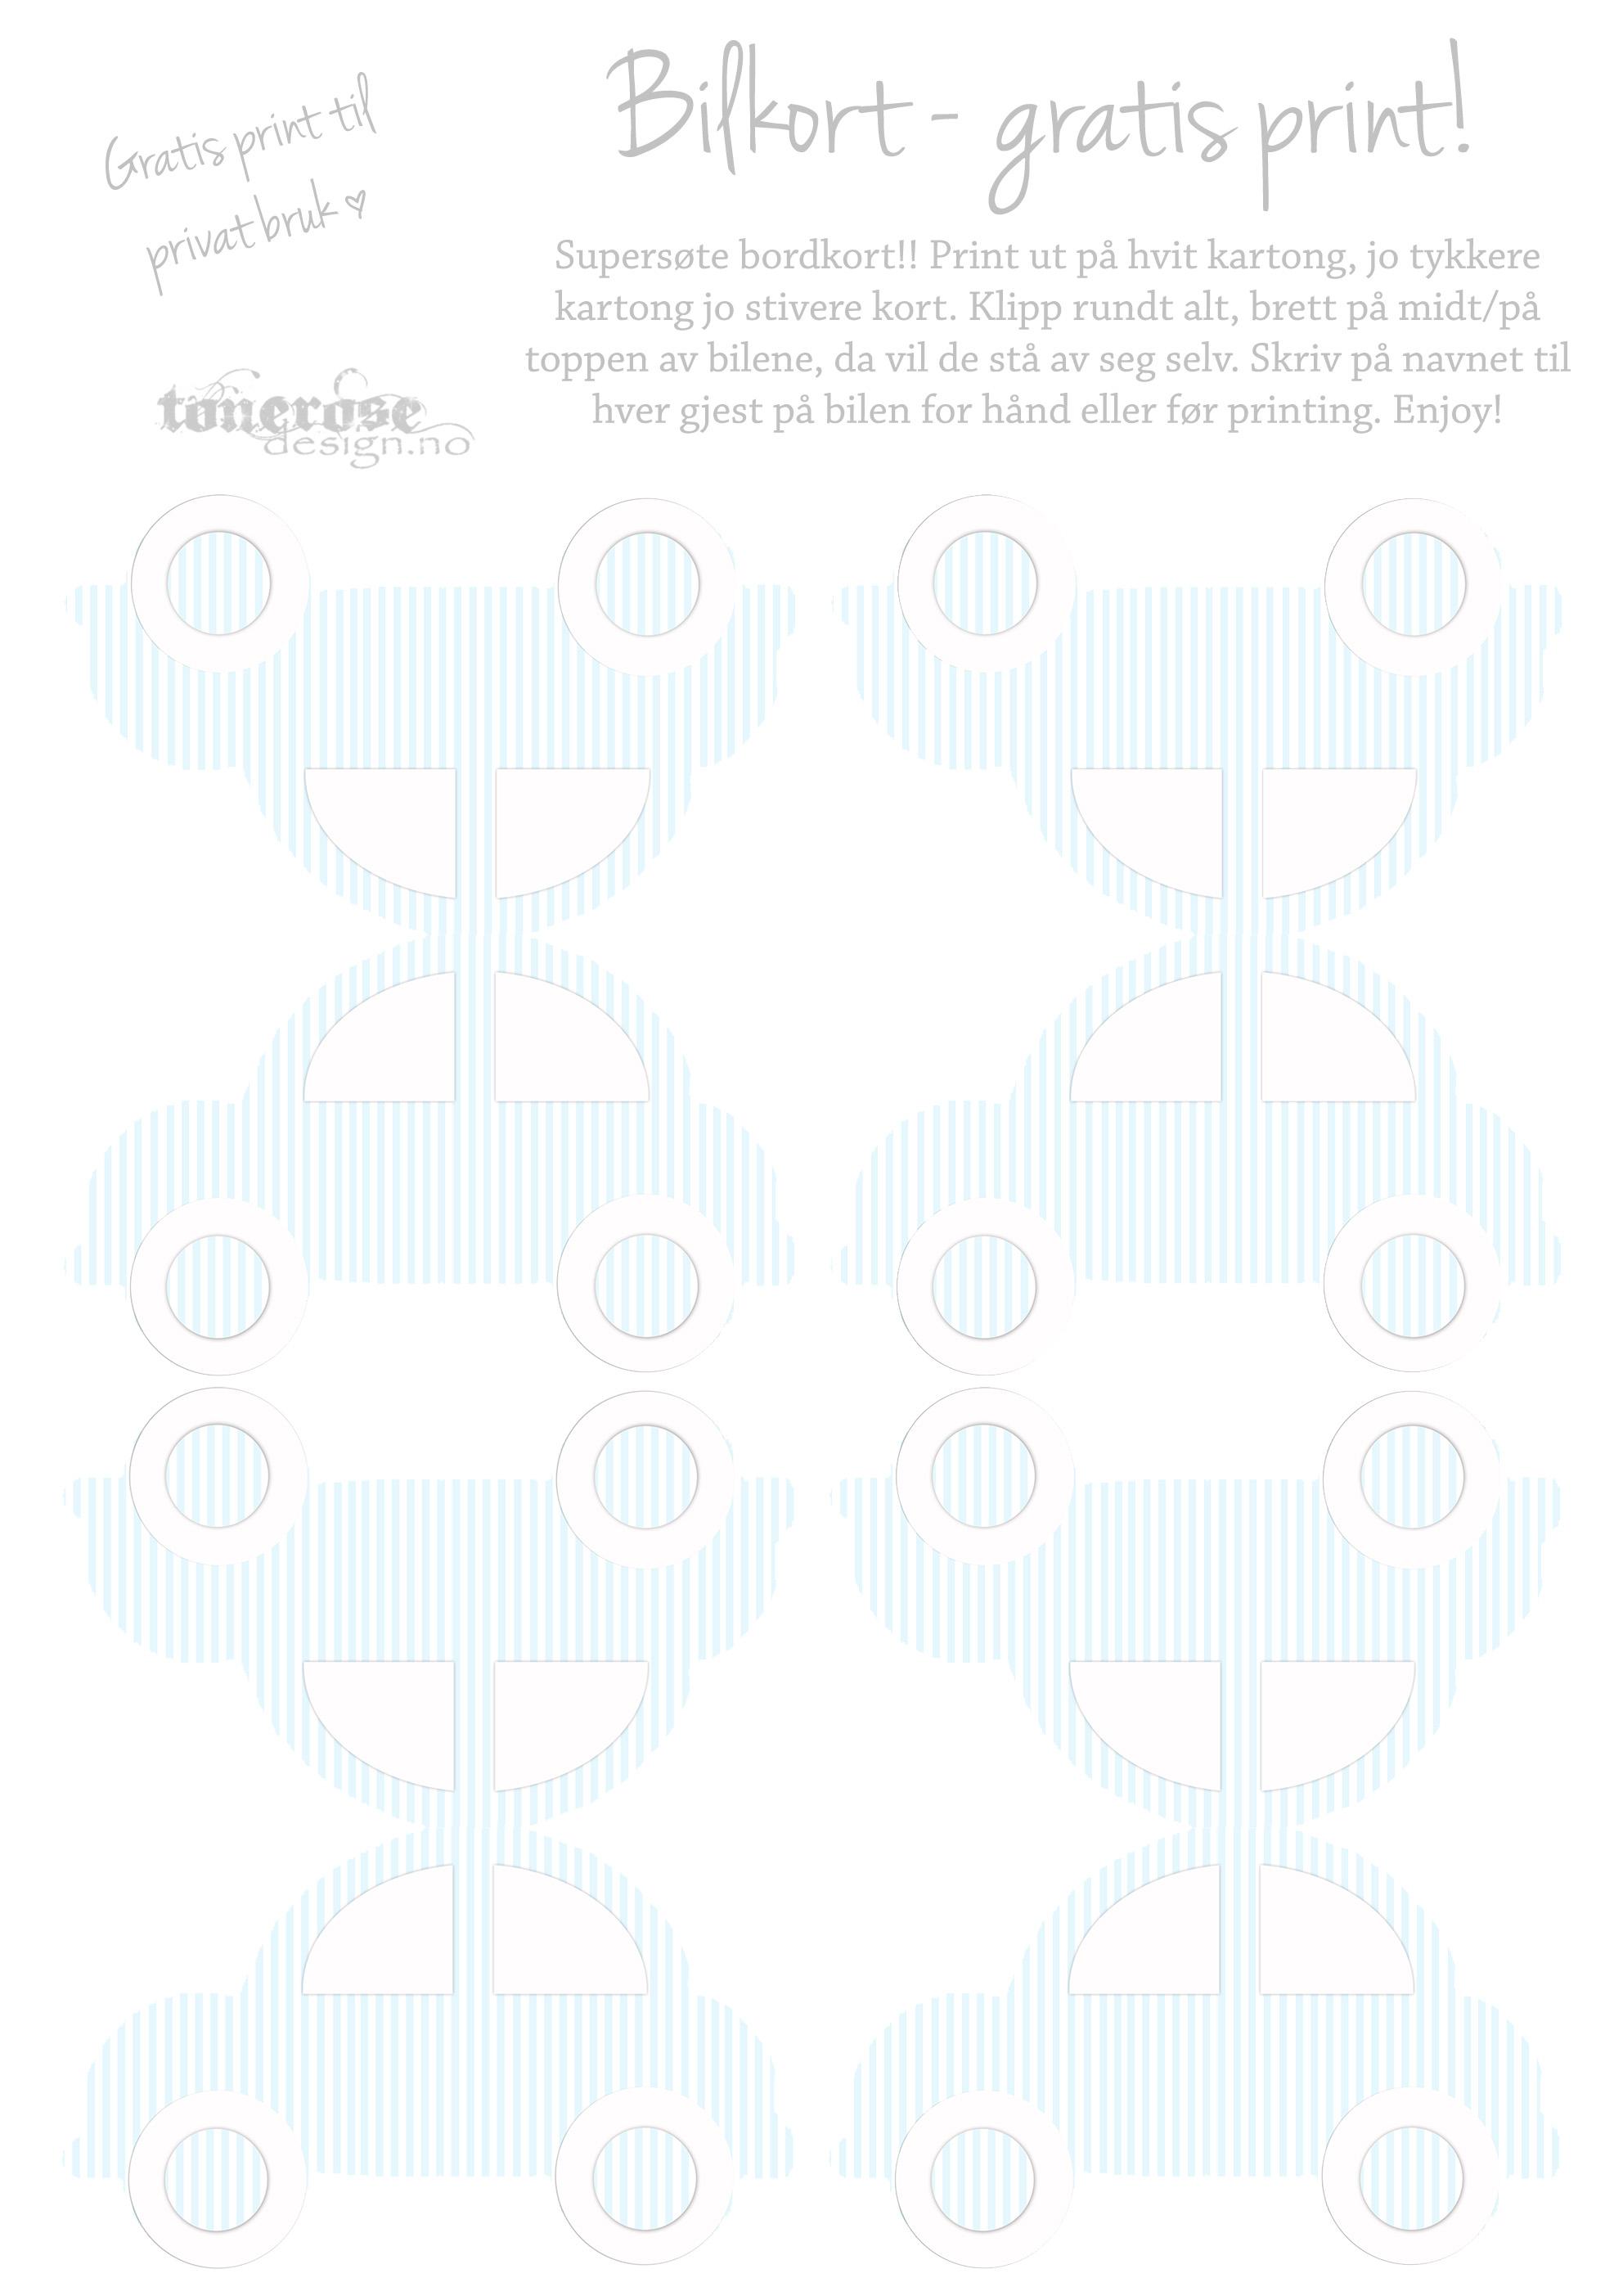 Boblebil bordkort gratis print tonerose design